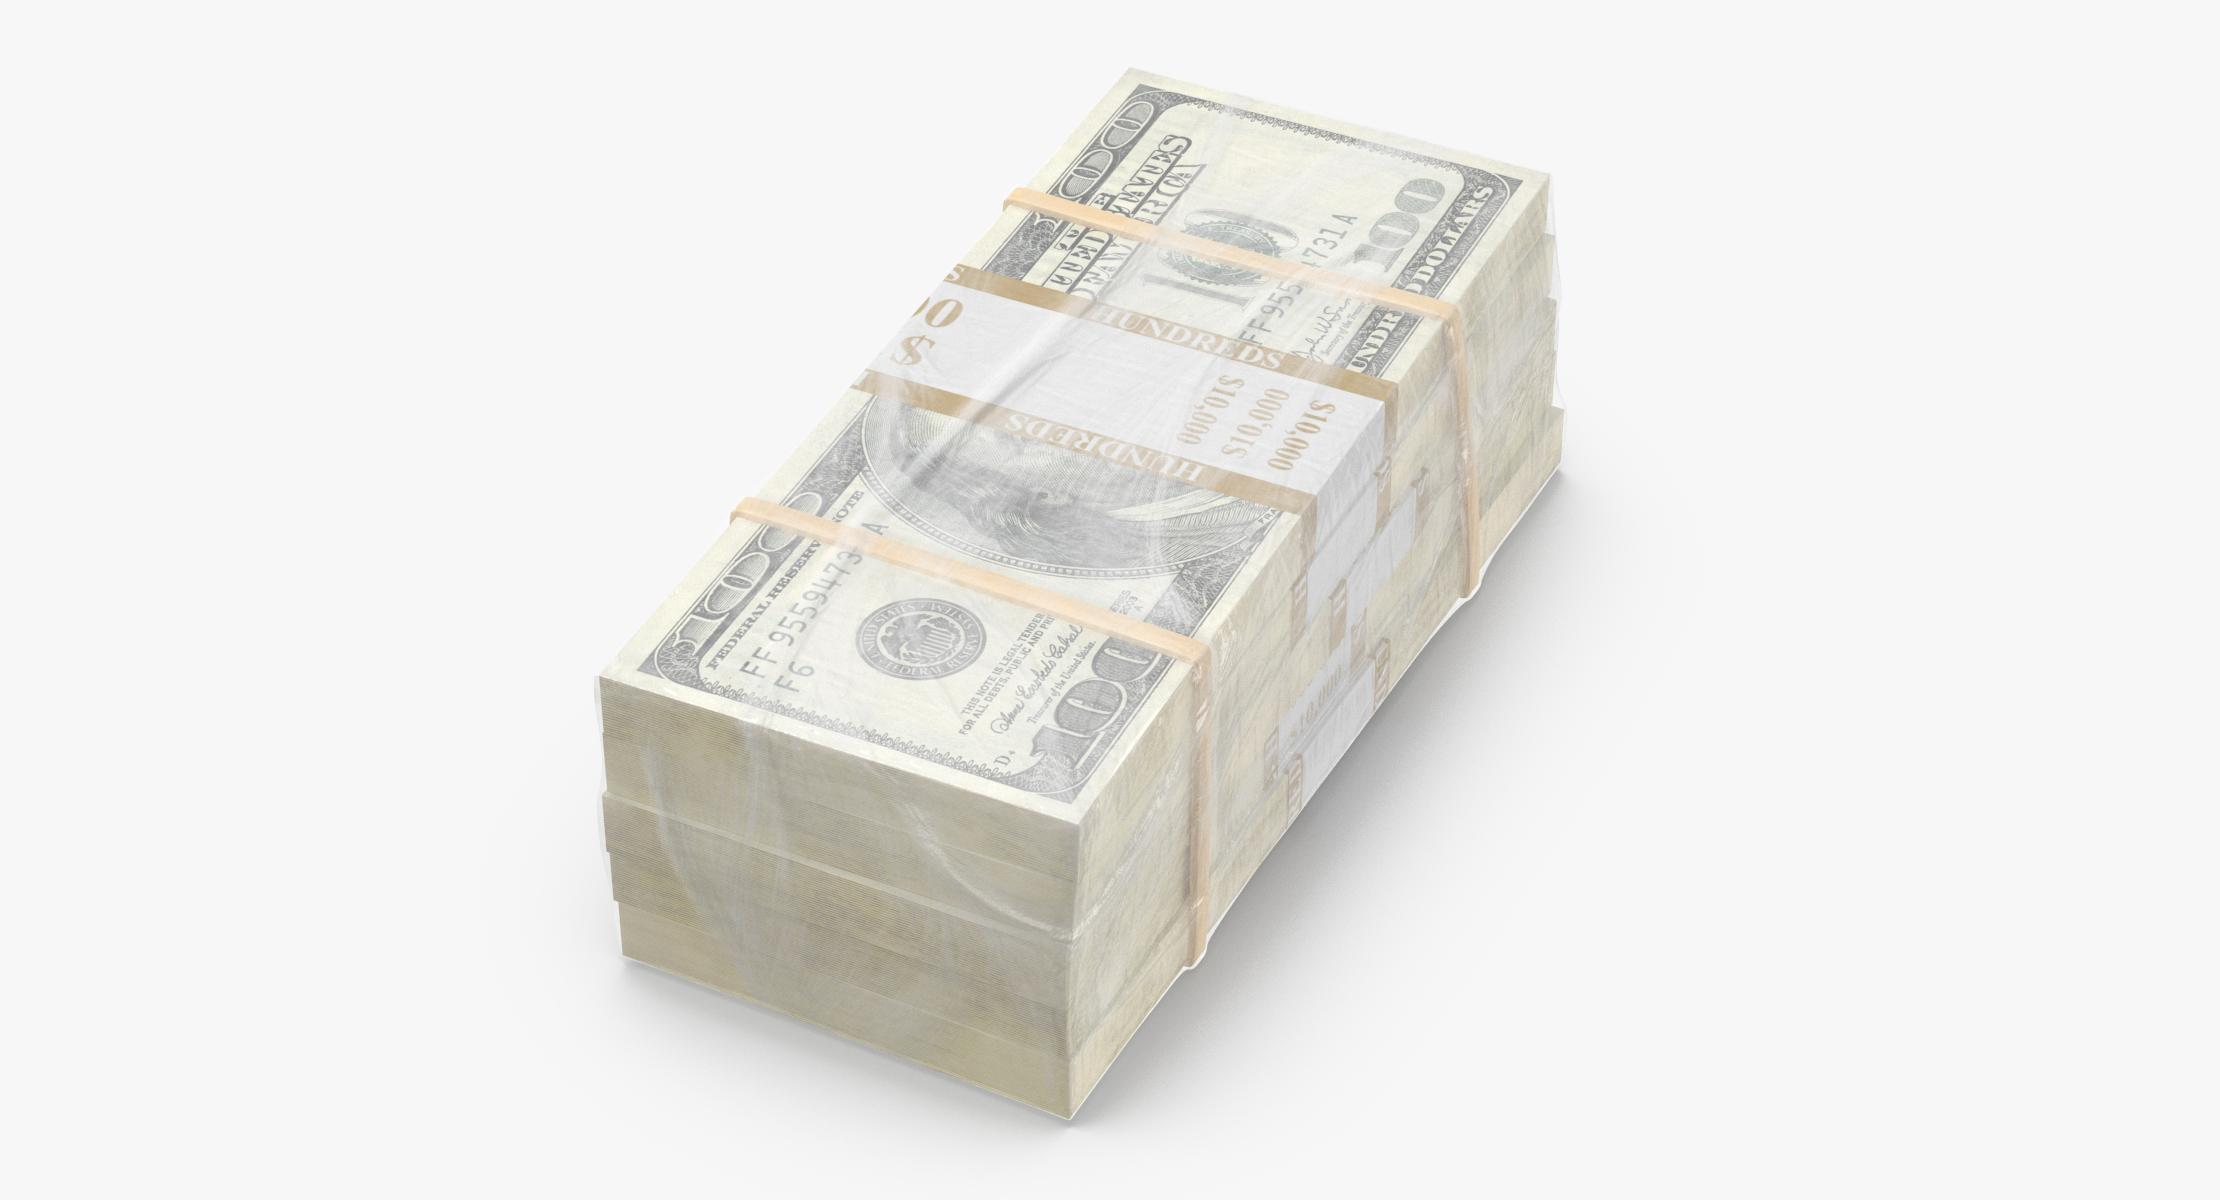 Wrapped Bills of Money - 100 Dollar Stacks 02 - reel 1